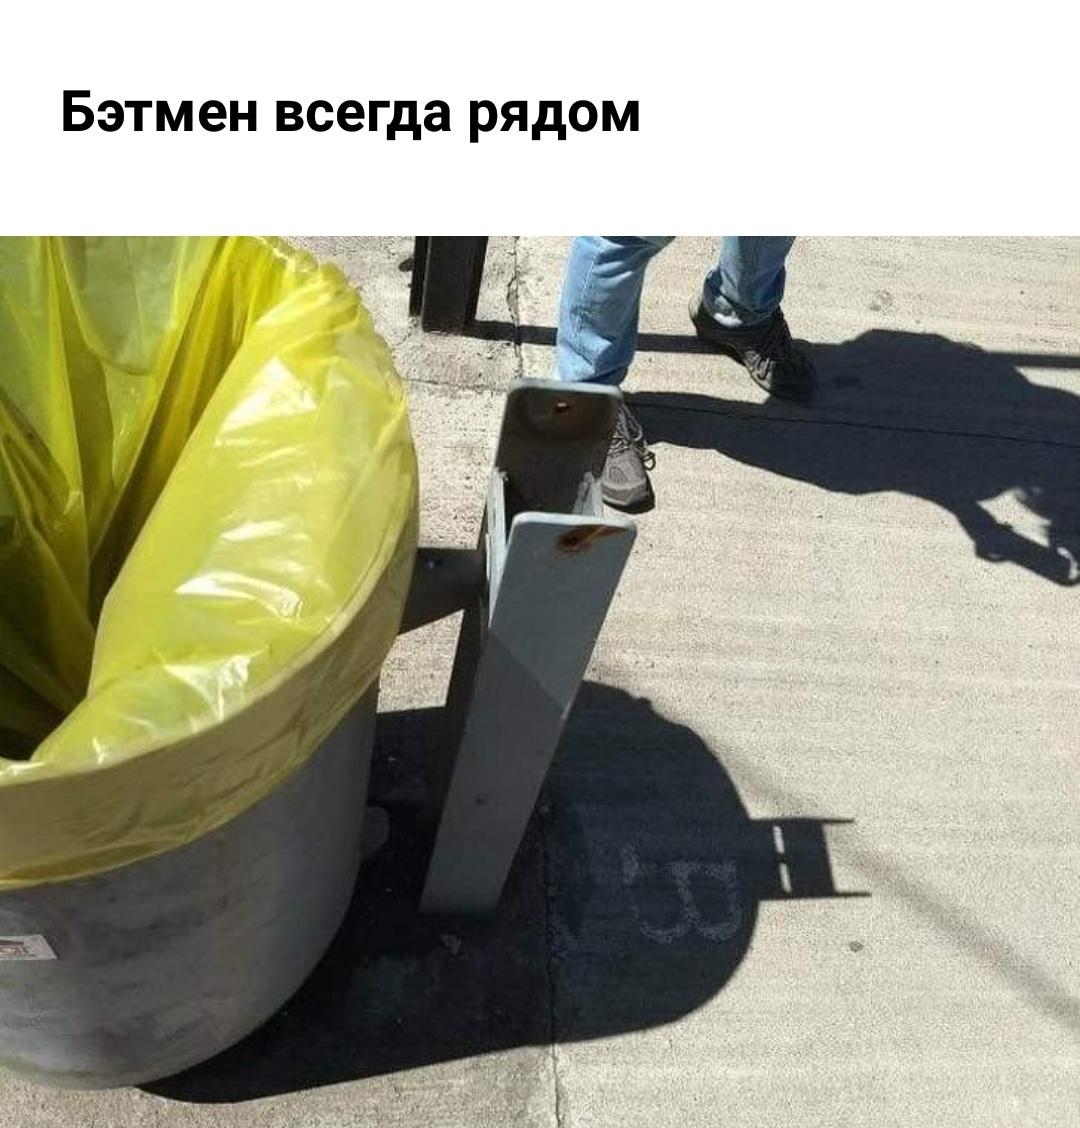 http://s8.uplds.ru/g2KW8.jpg